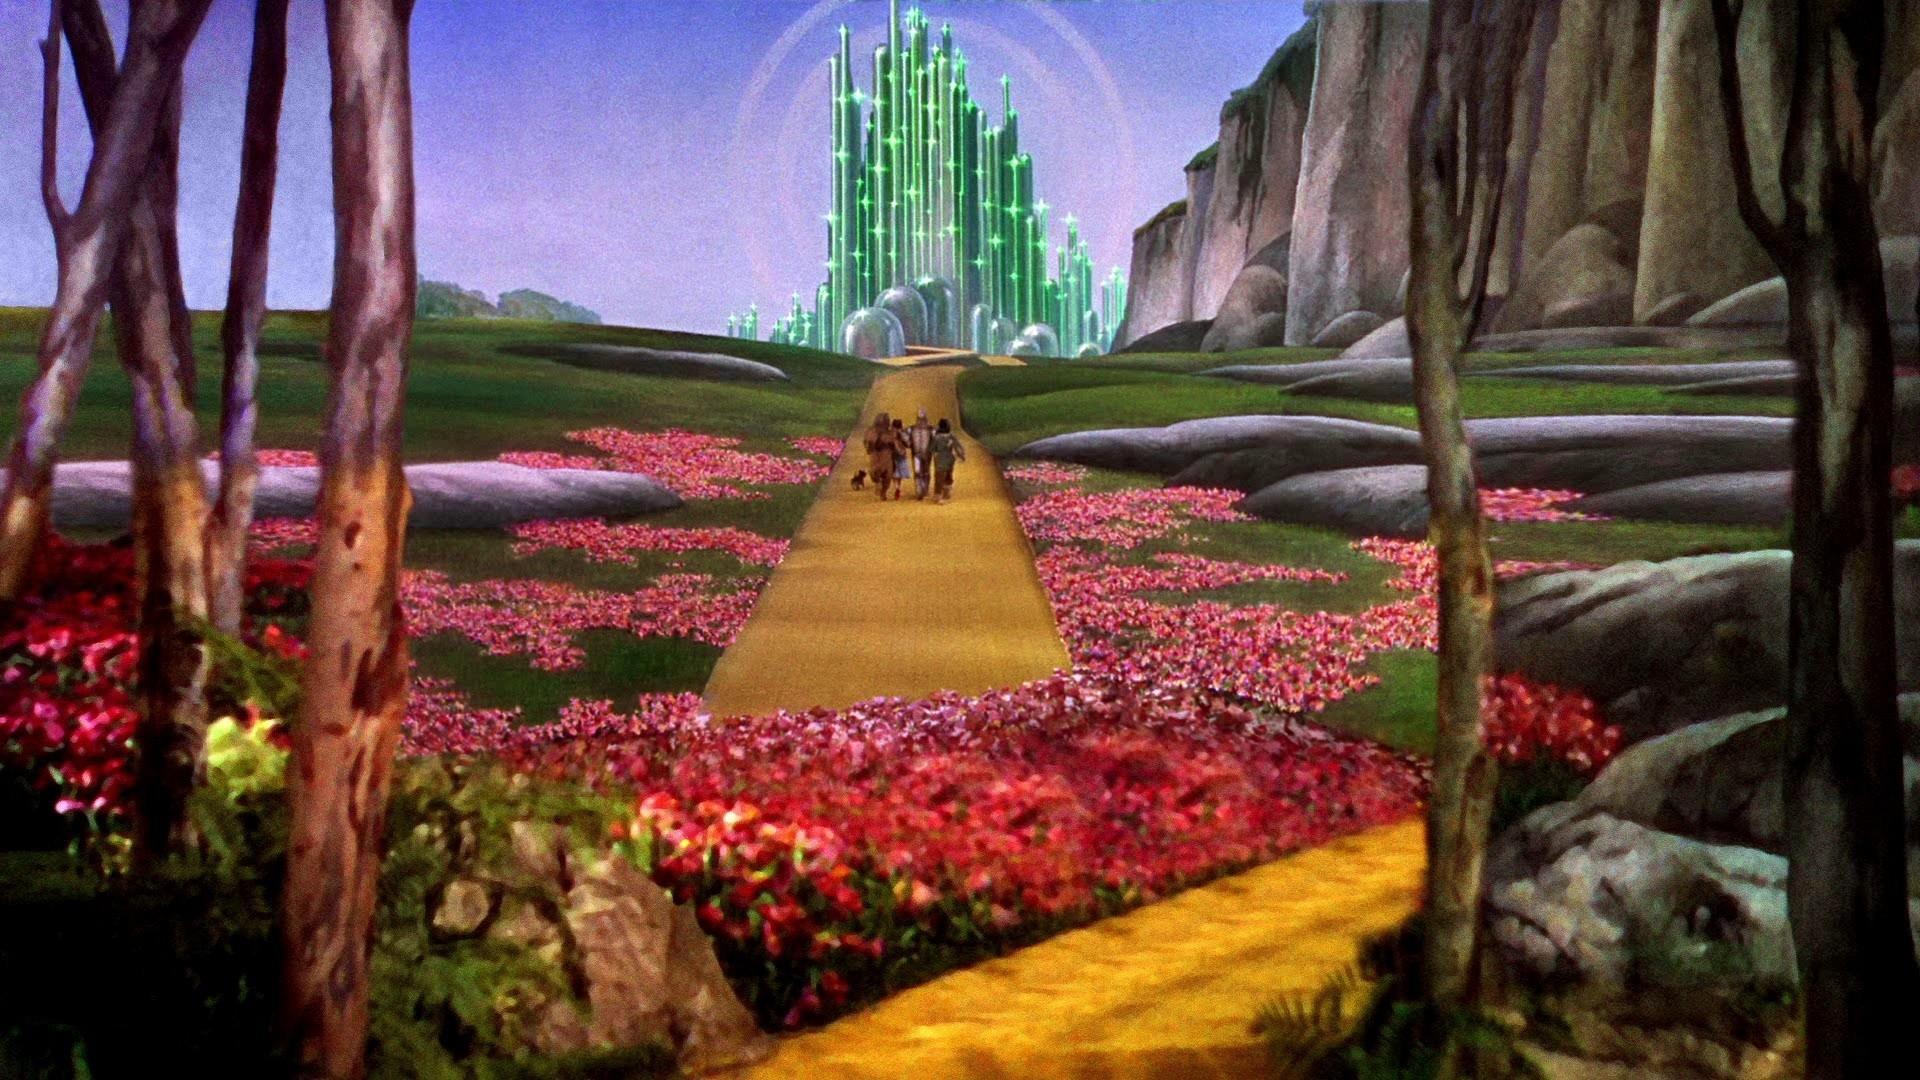 Wizard Of Oz Wallpaper Wallpapertag